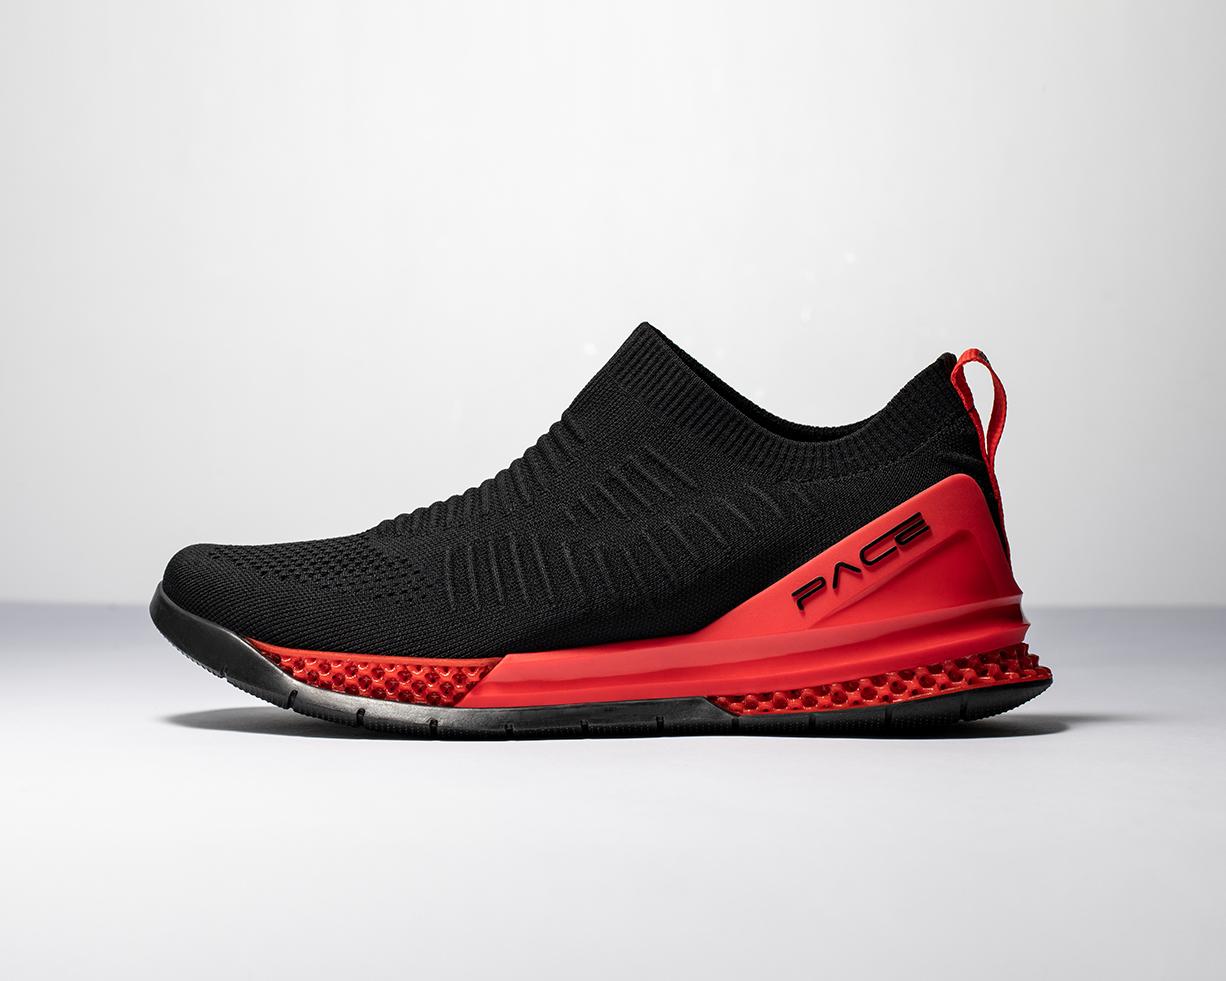 3D 打印实现量产 | Revo 塑成科技推出新一代 3D 打印运动鞋